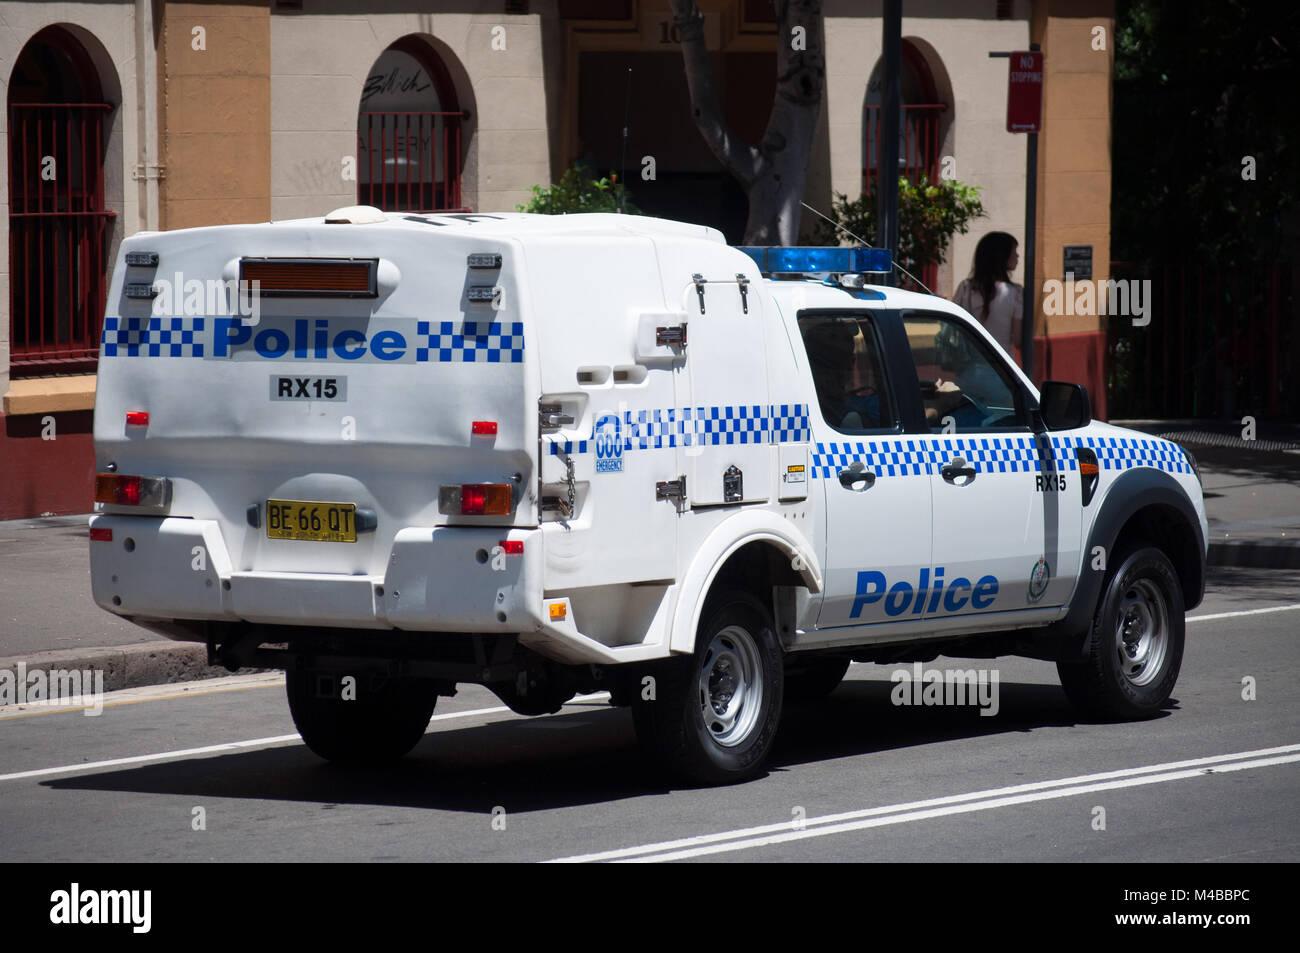 Sydney Police Stock Photos & Sydney Police Stock Images - Alamy